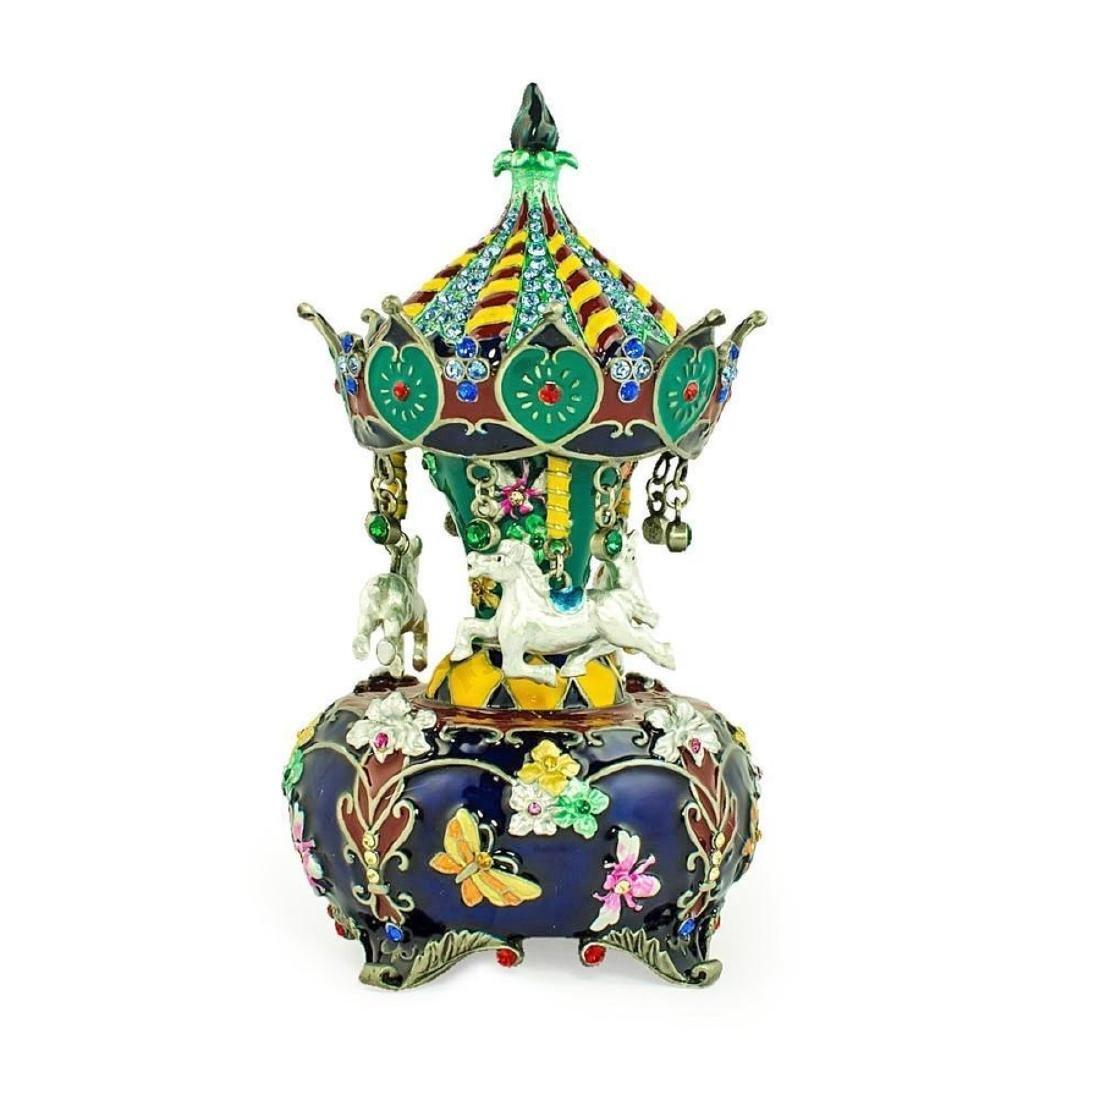 Jeweled Royal Inspired Russian Carousel Figurine 5.5